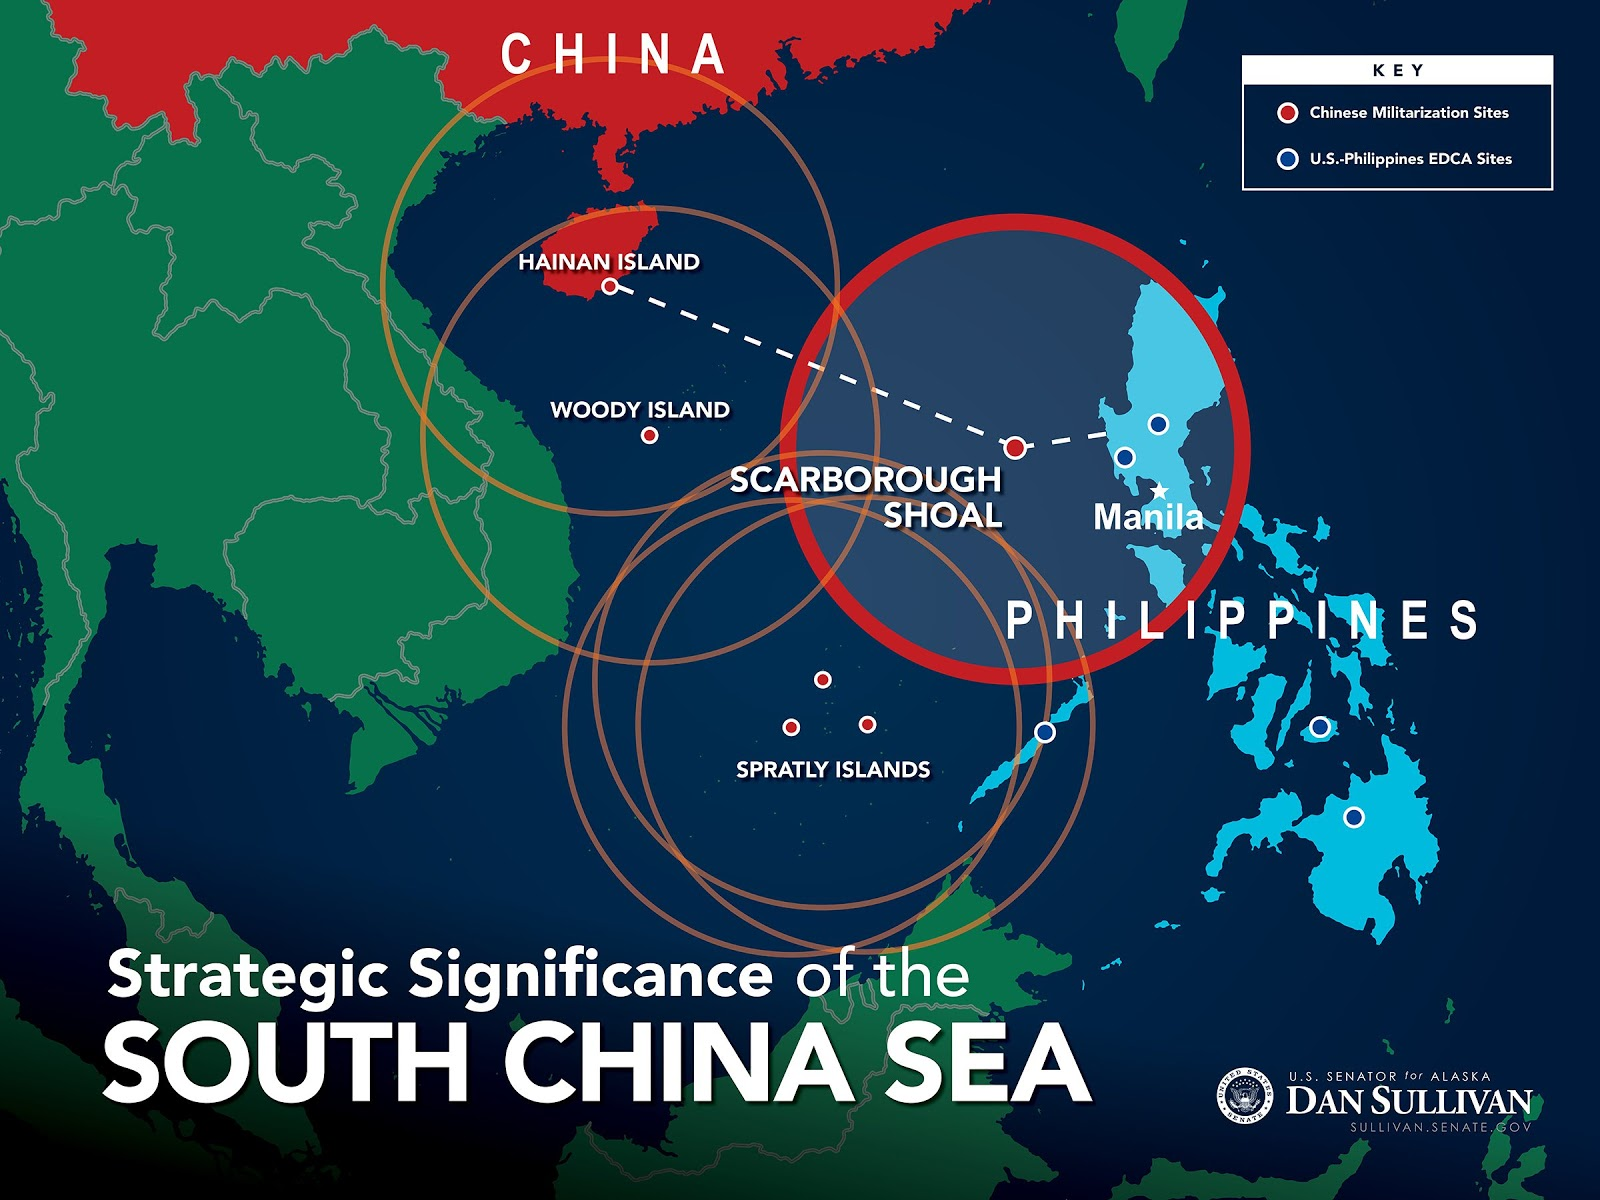 SouthChinaSea_Map_US_Sen_Sullivan.jpg